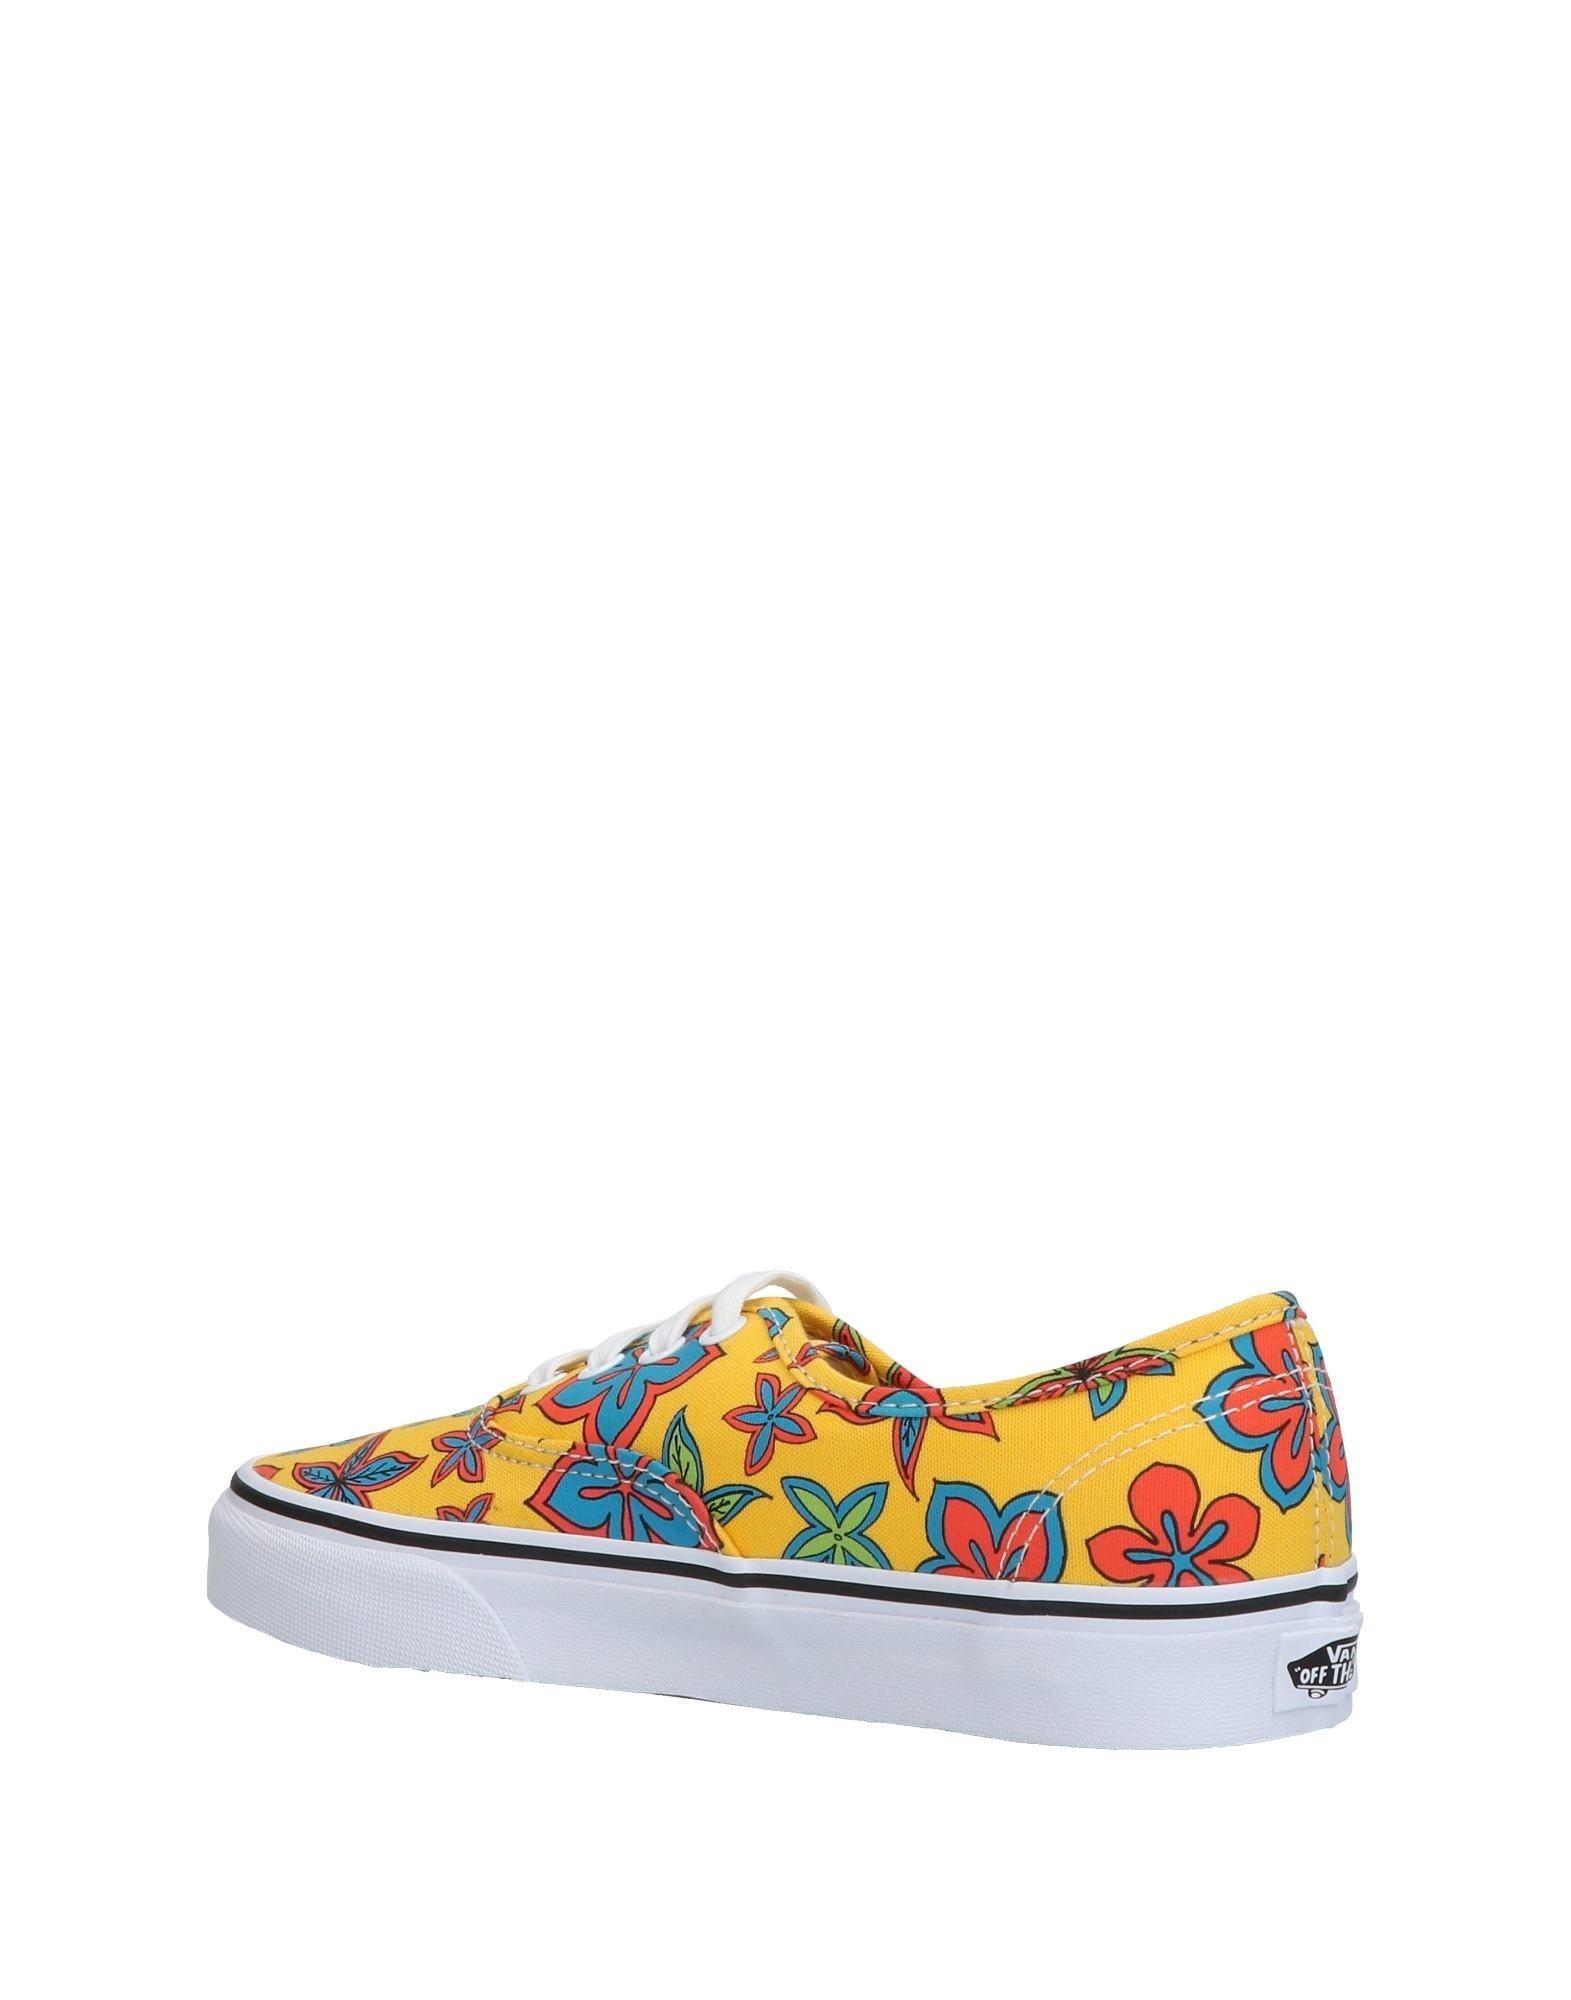 Vans Gute Sneakers Damen  11354279NU Gute Vans Qualität beliebte Schuhe 843d4f